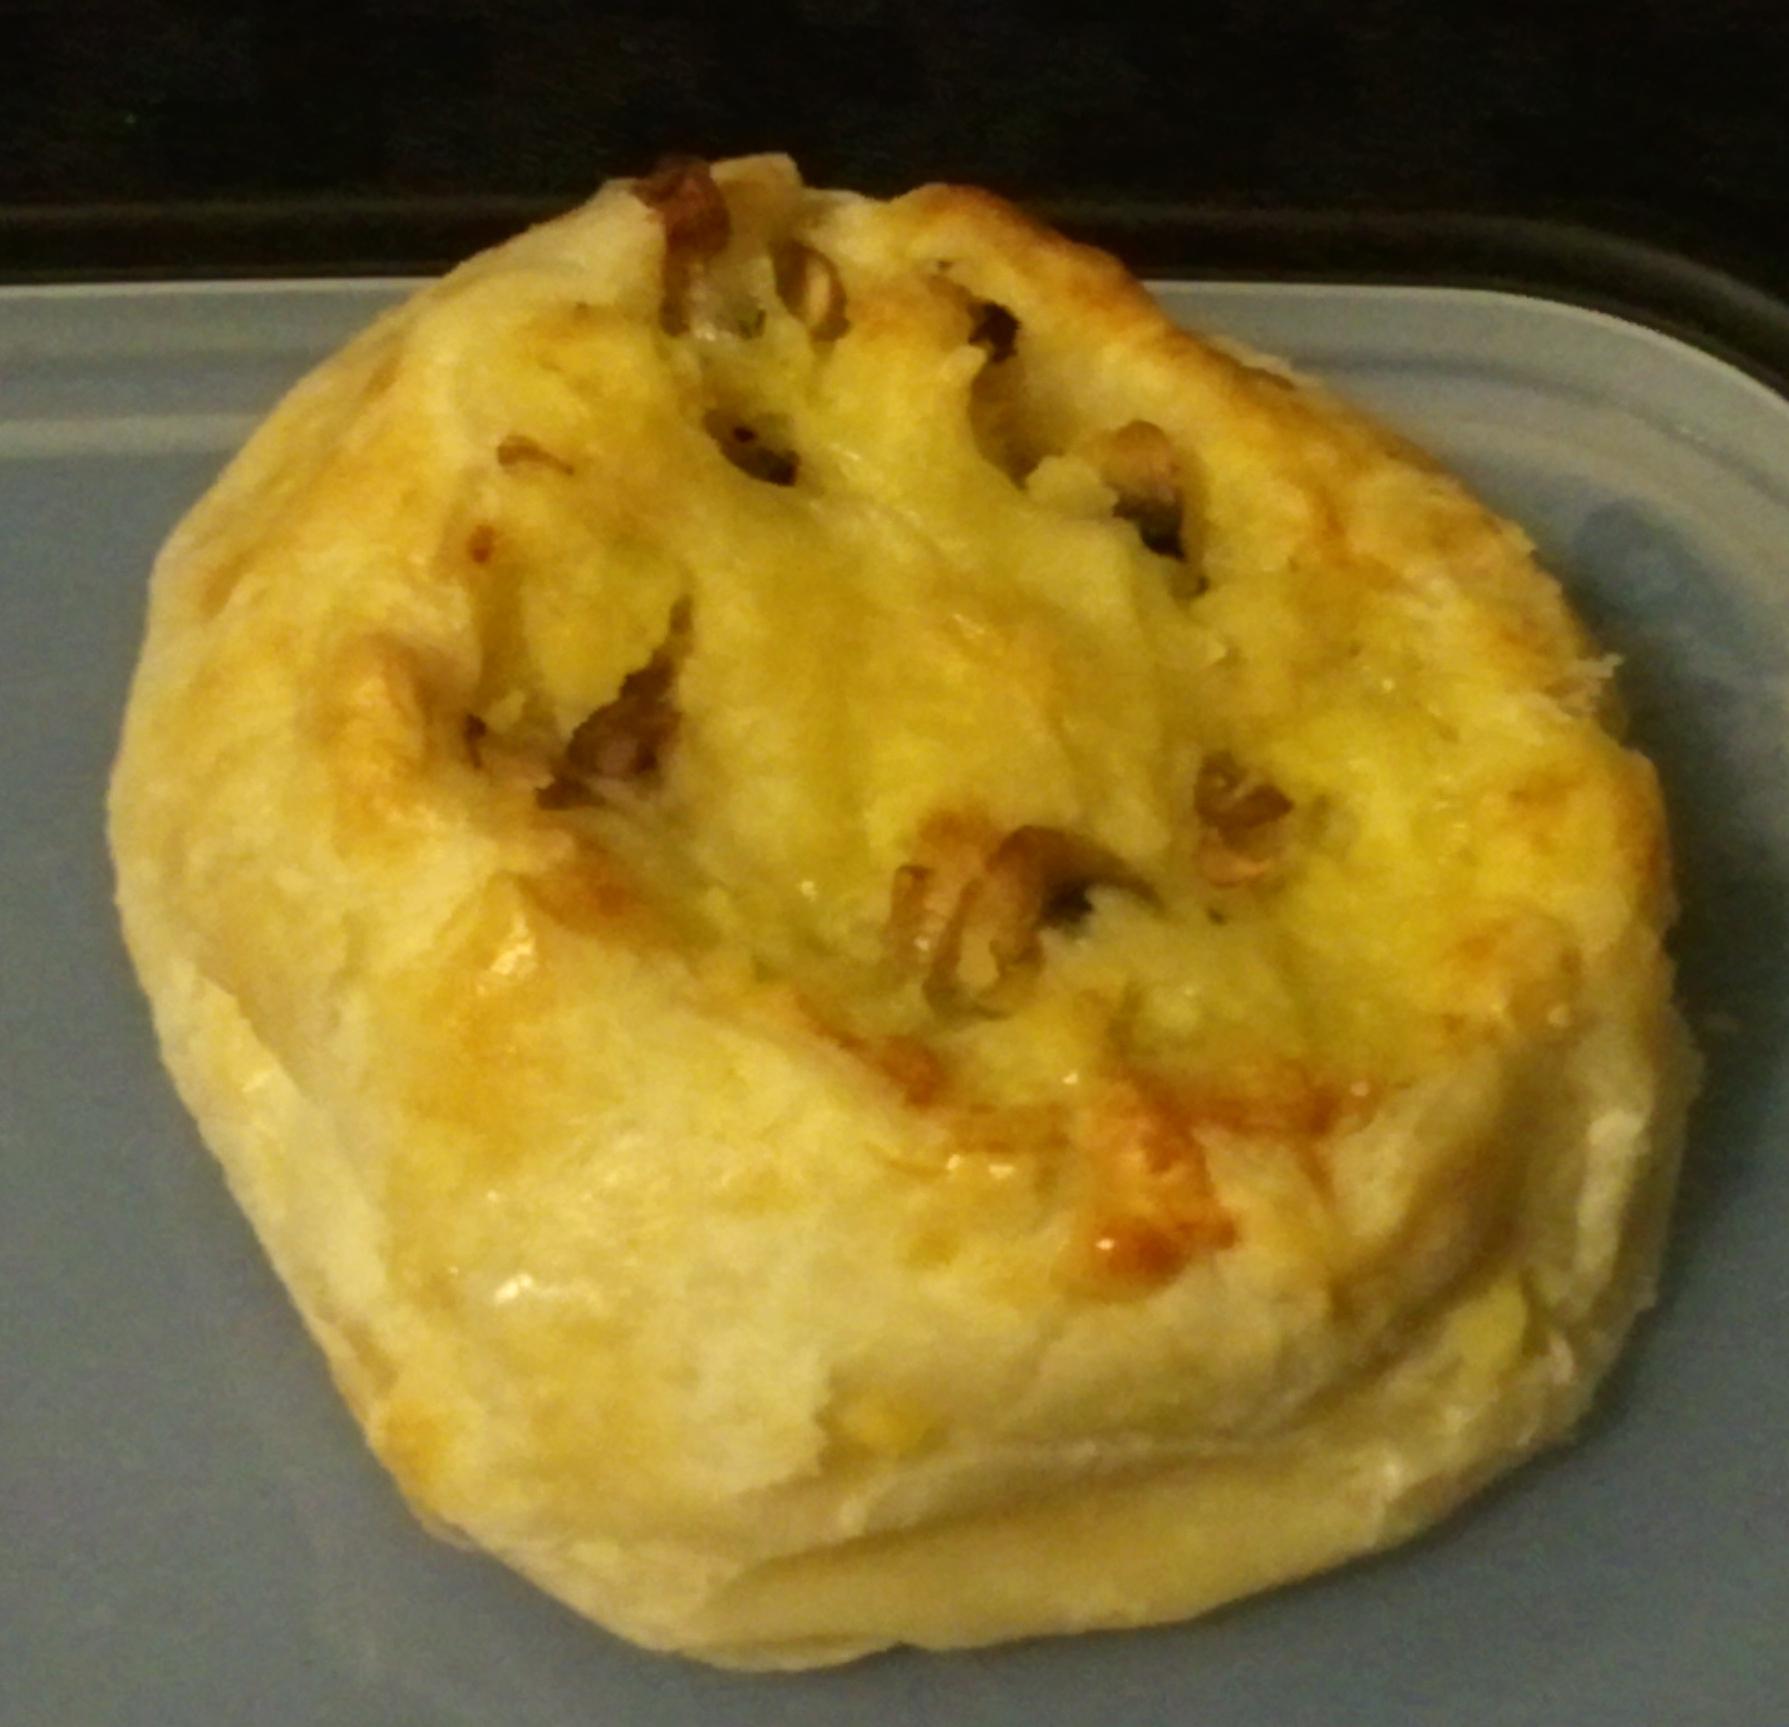 potatisbakelse västerbottenost smördeg